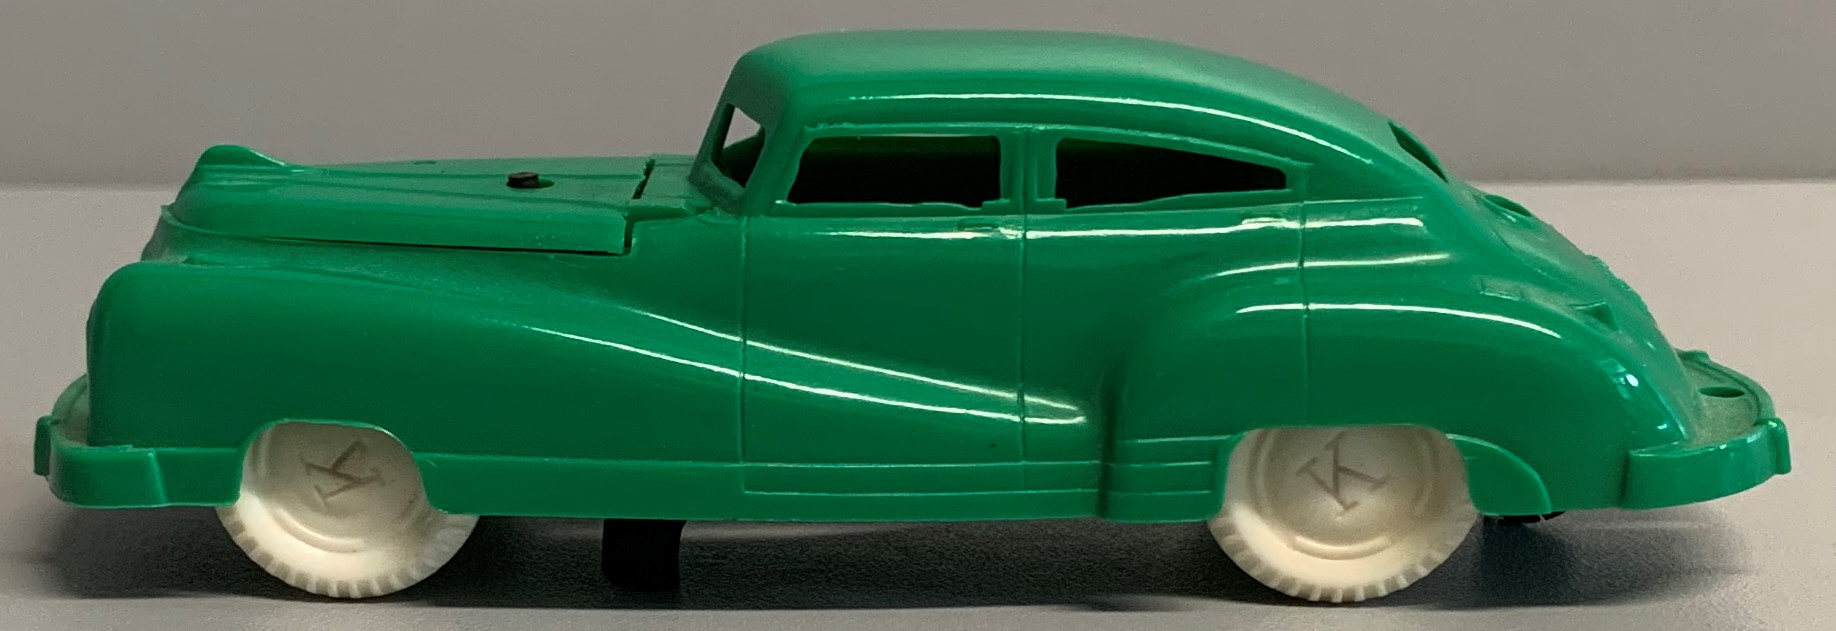 Keystone Green Plastic Car